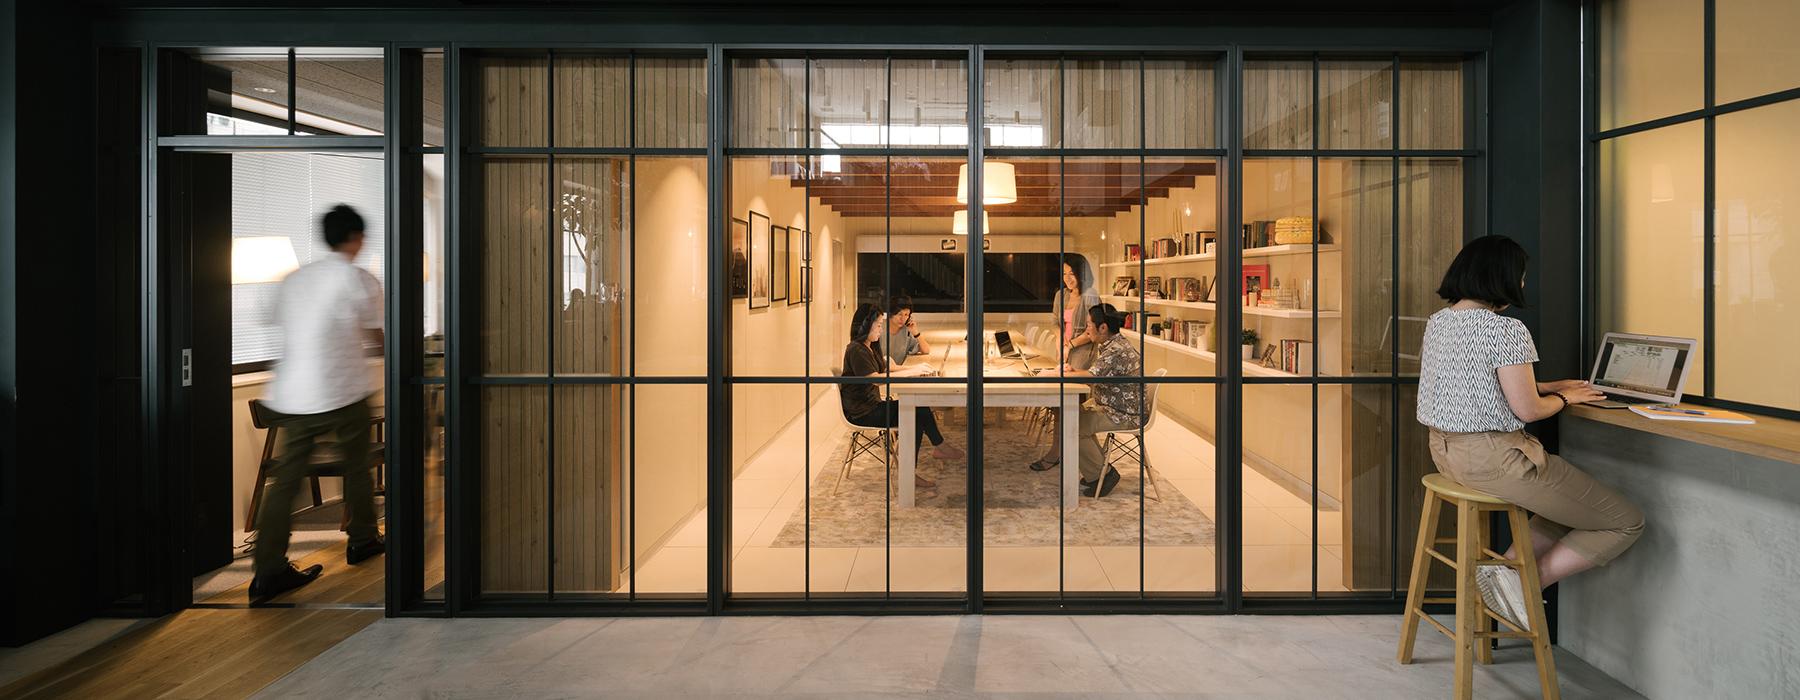 airbnb-tokyo-office-interiors-japan-suppose-design-office-designboom-1800